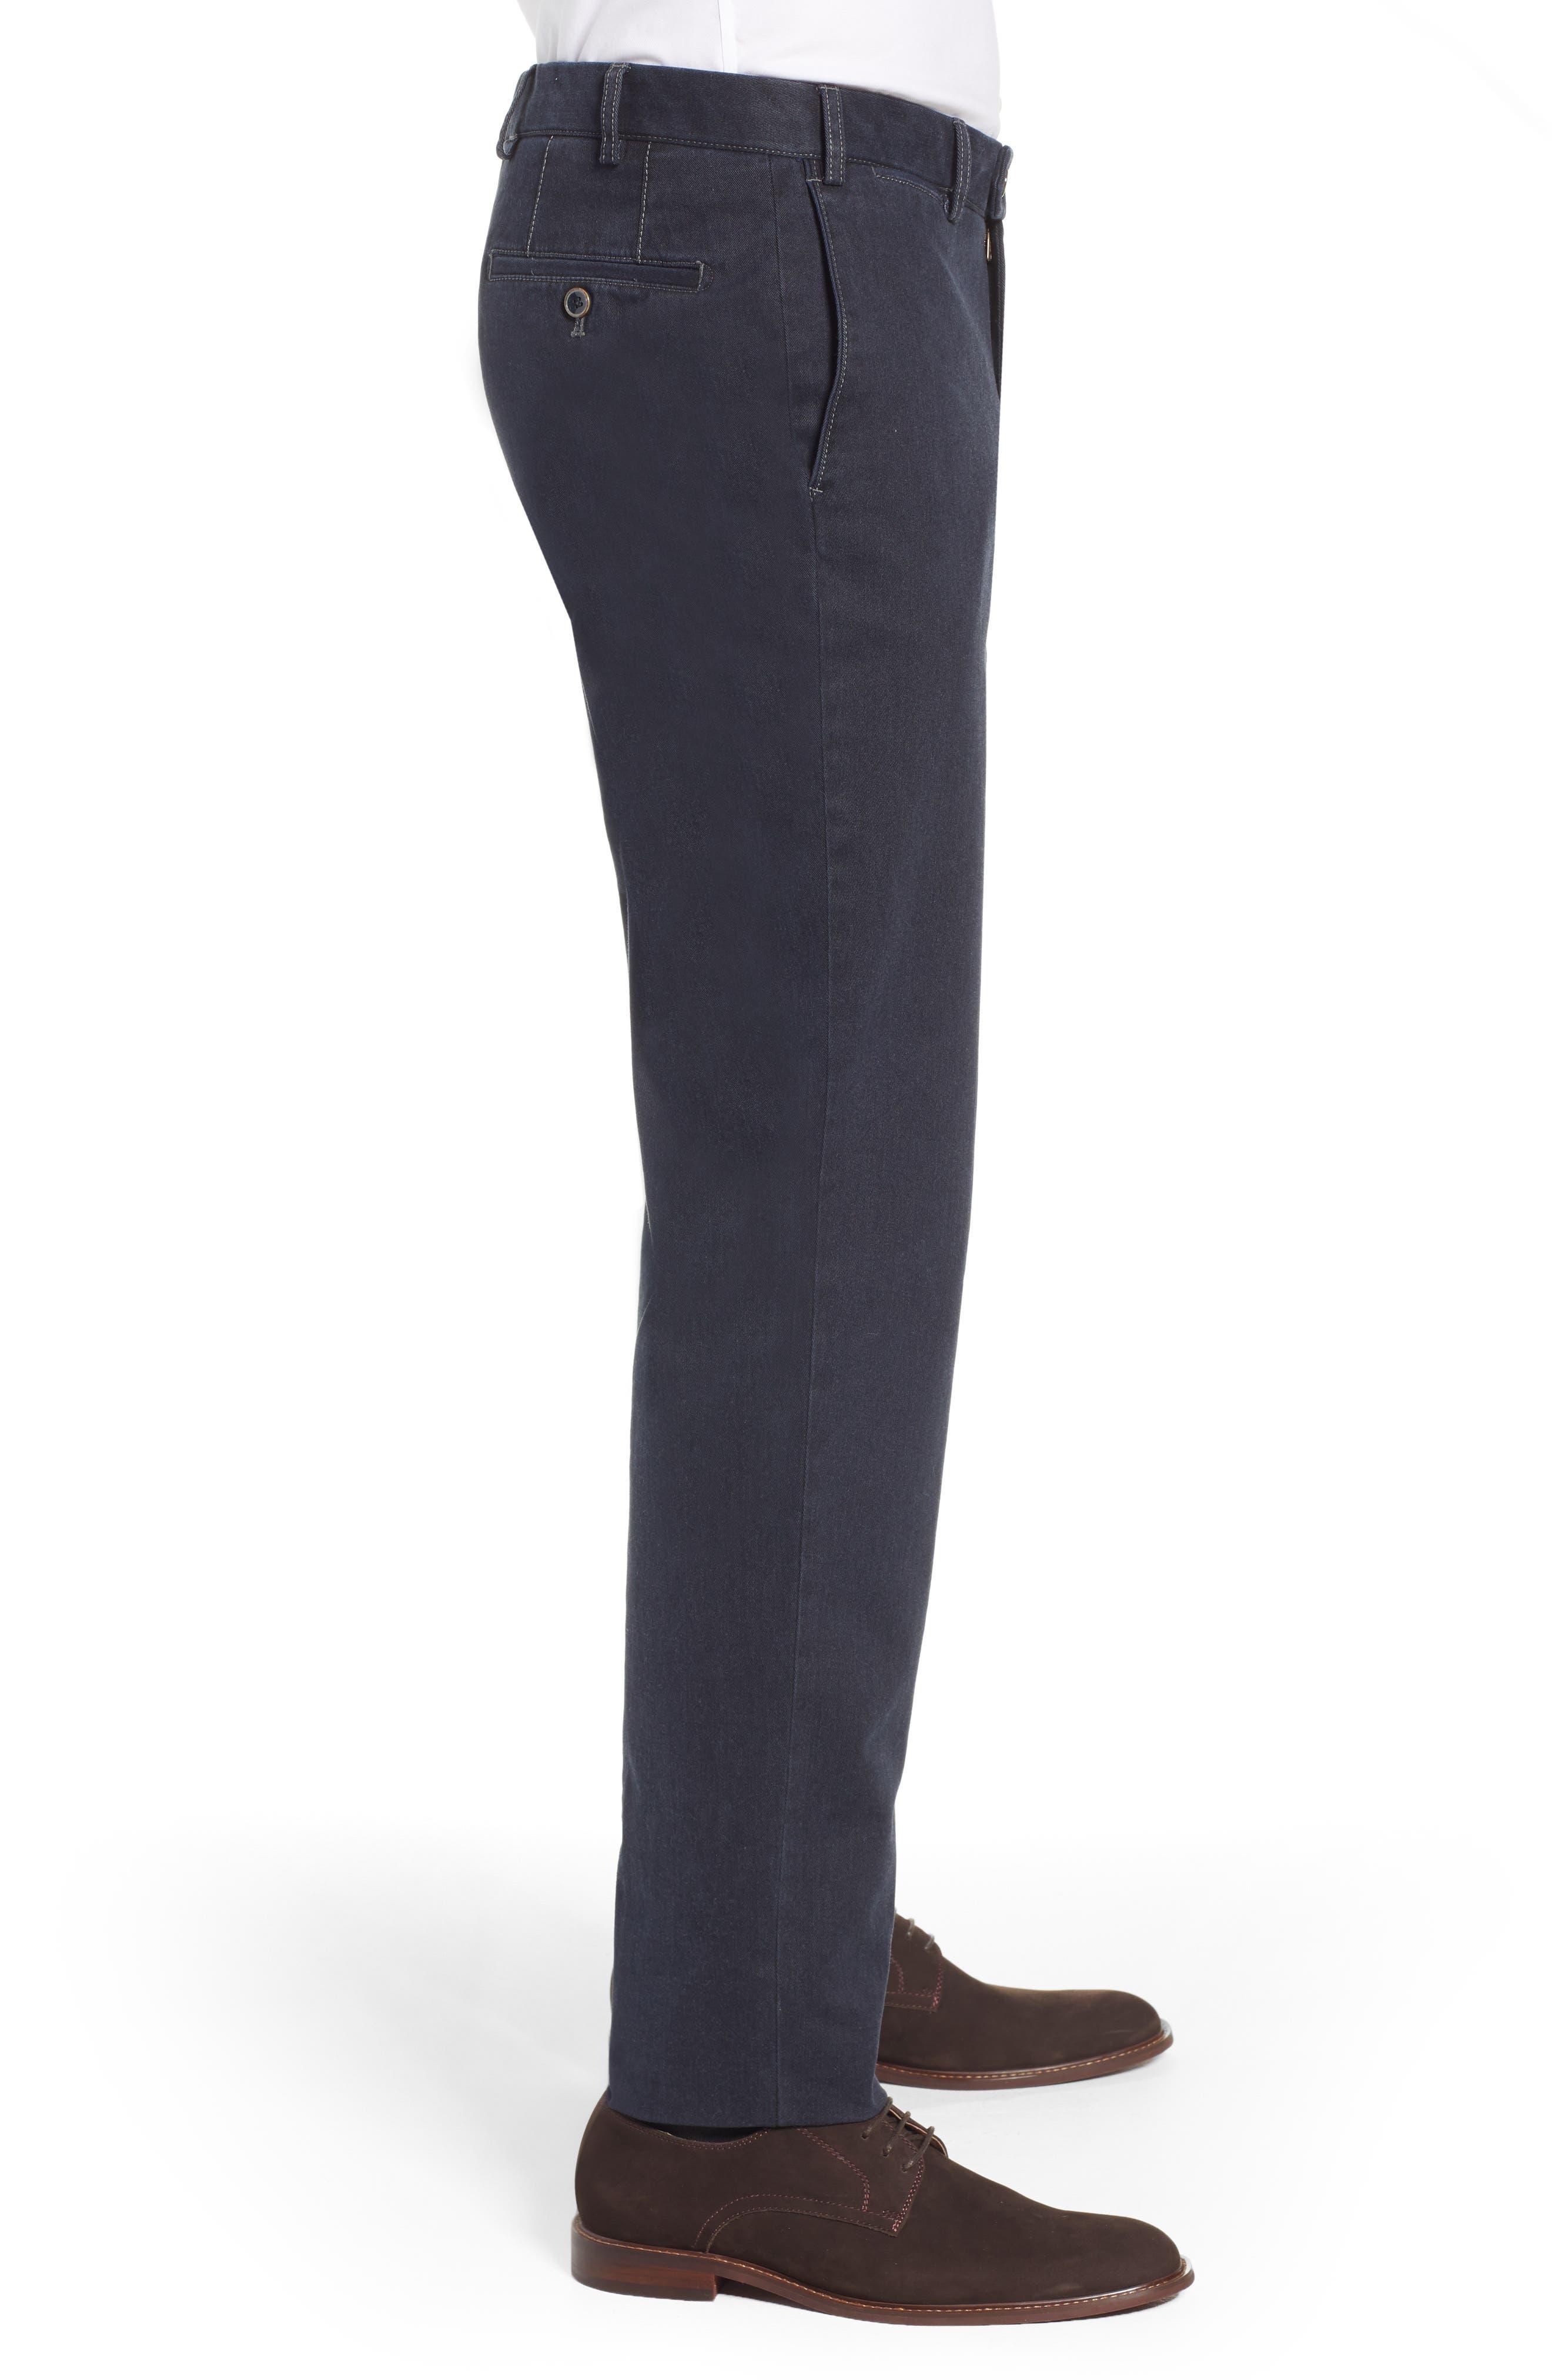 Pero Trim Fit Stretch Flat Front Cotton Blend Trousers,                             Alternate thumbnail 3, color,                             CHARCOAL